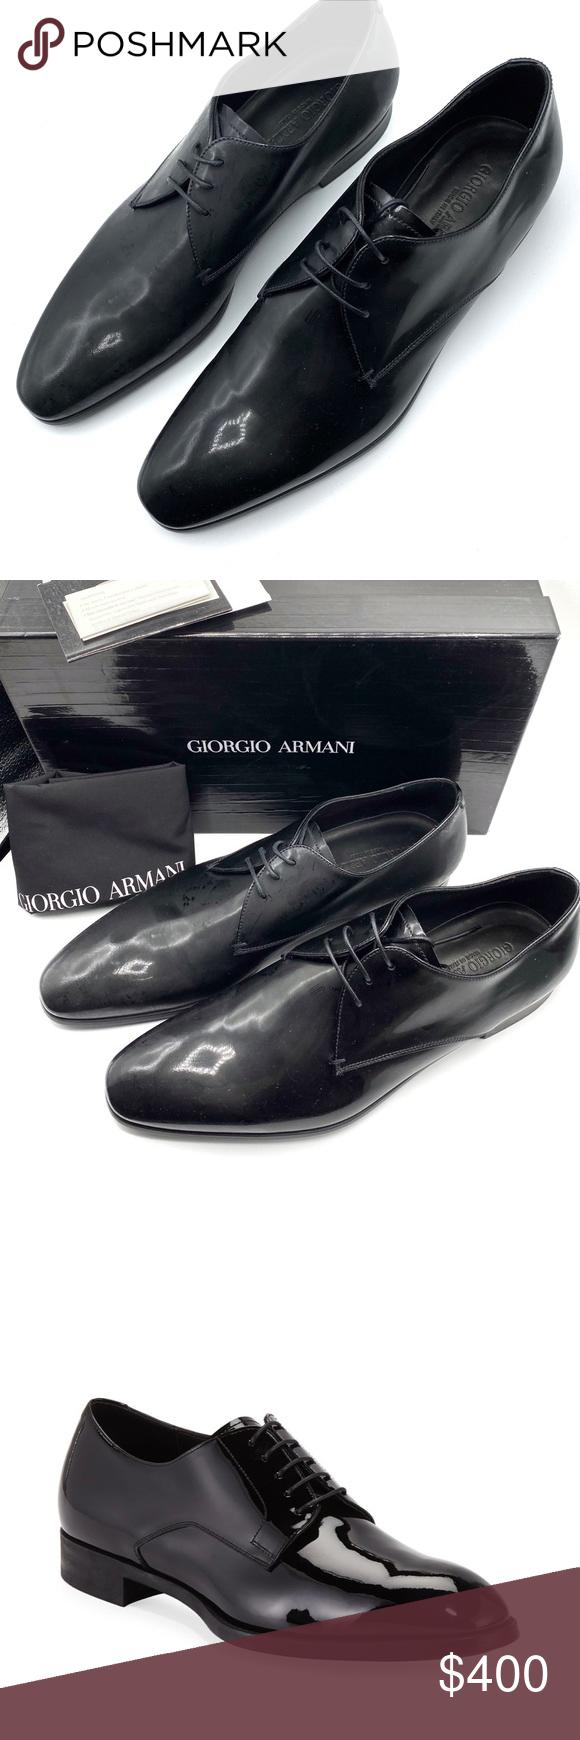 armani black formal shoes